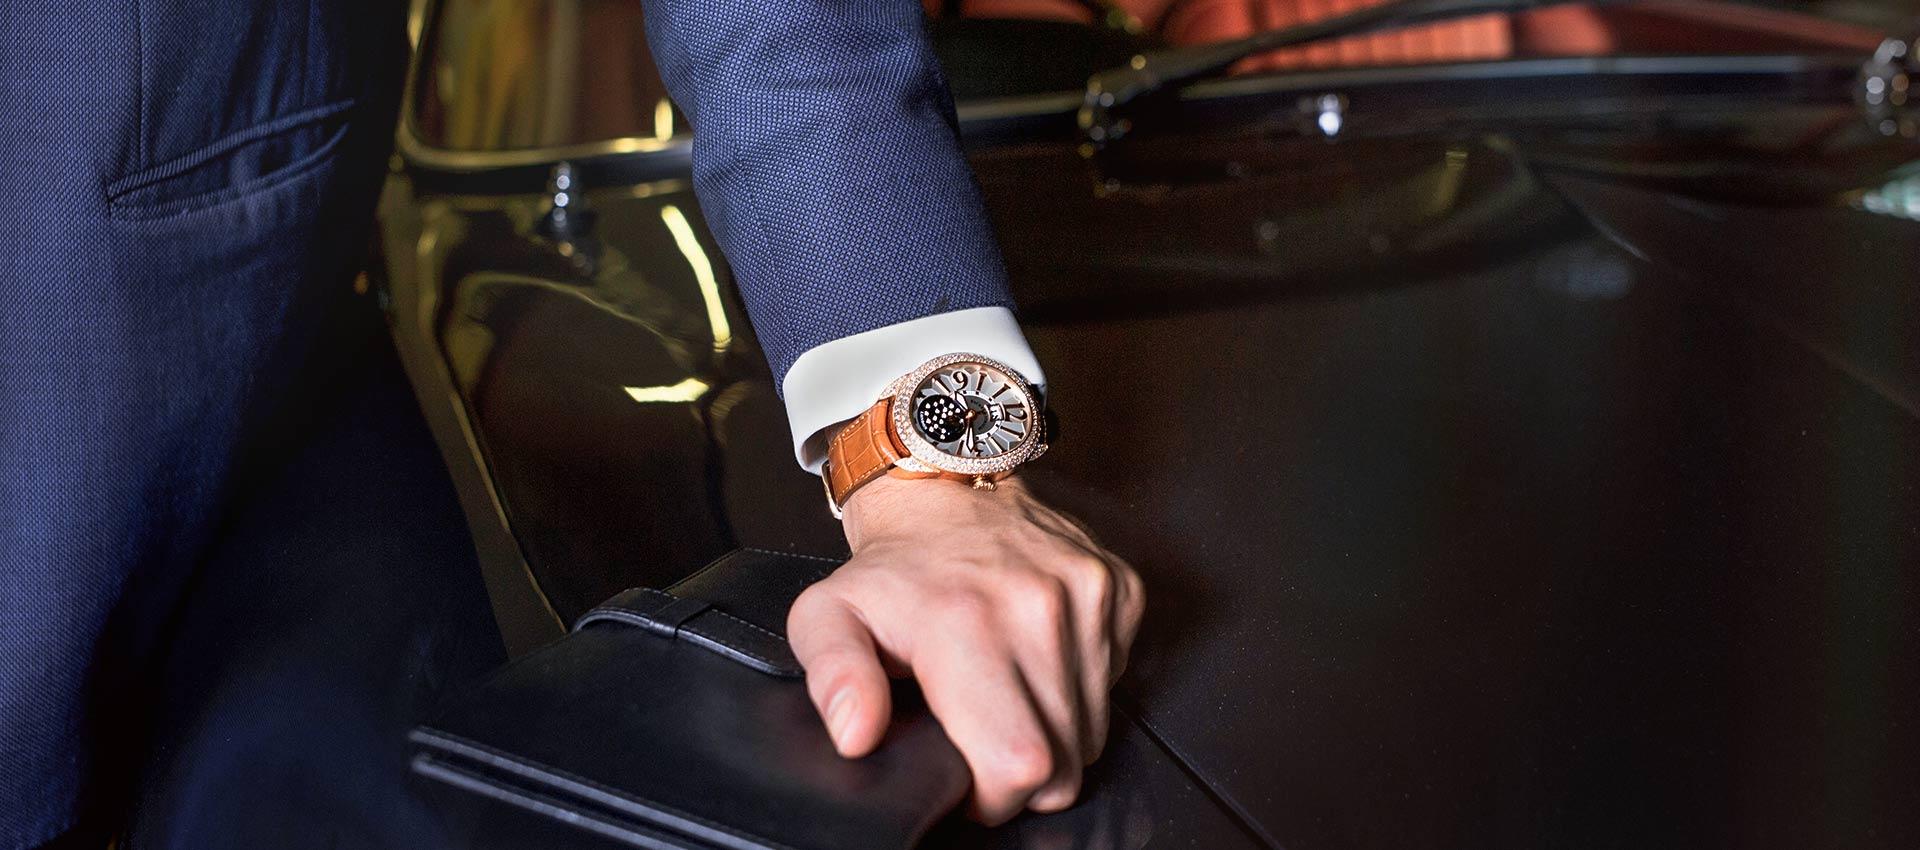 REGENT 1609 AD 4047 limited edition diamond wristwatch